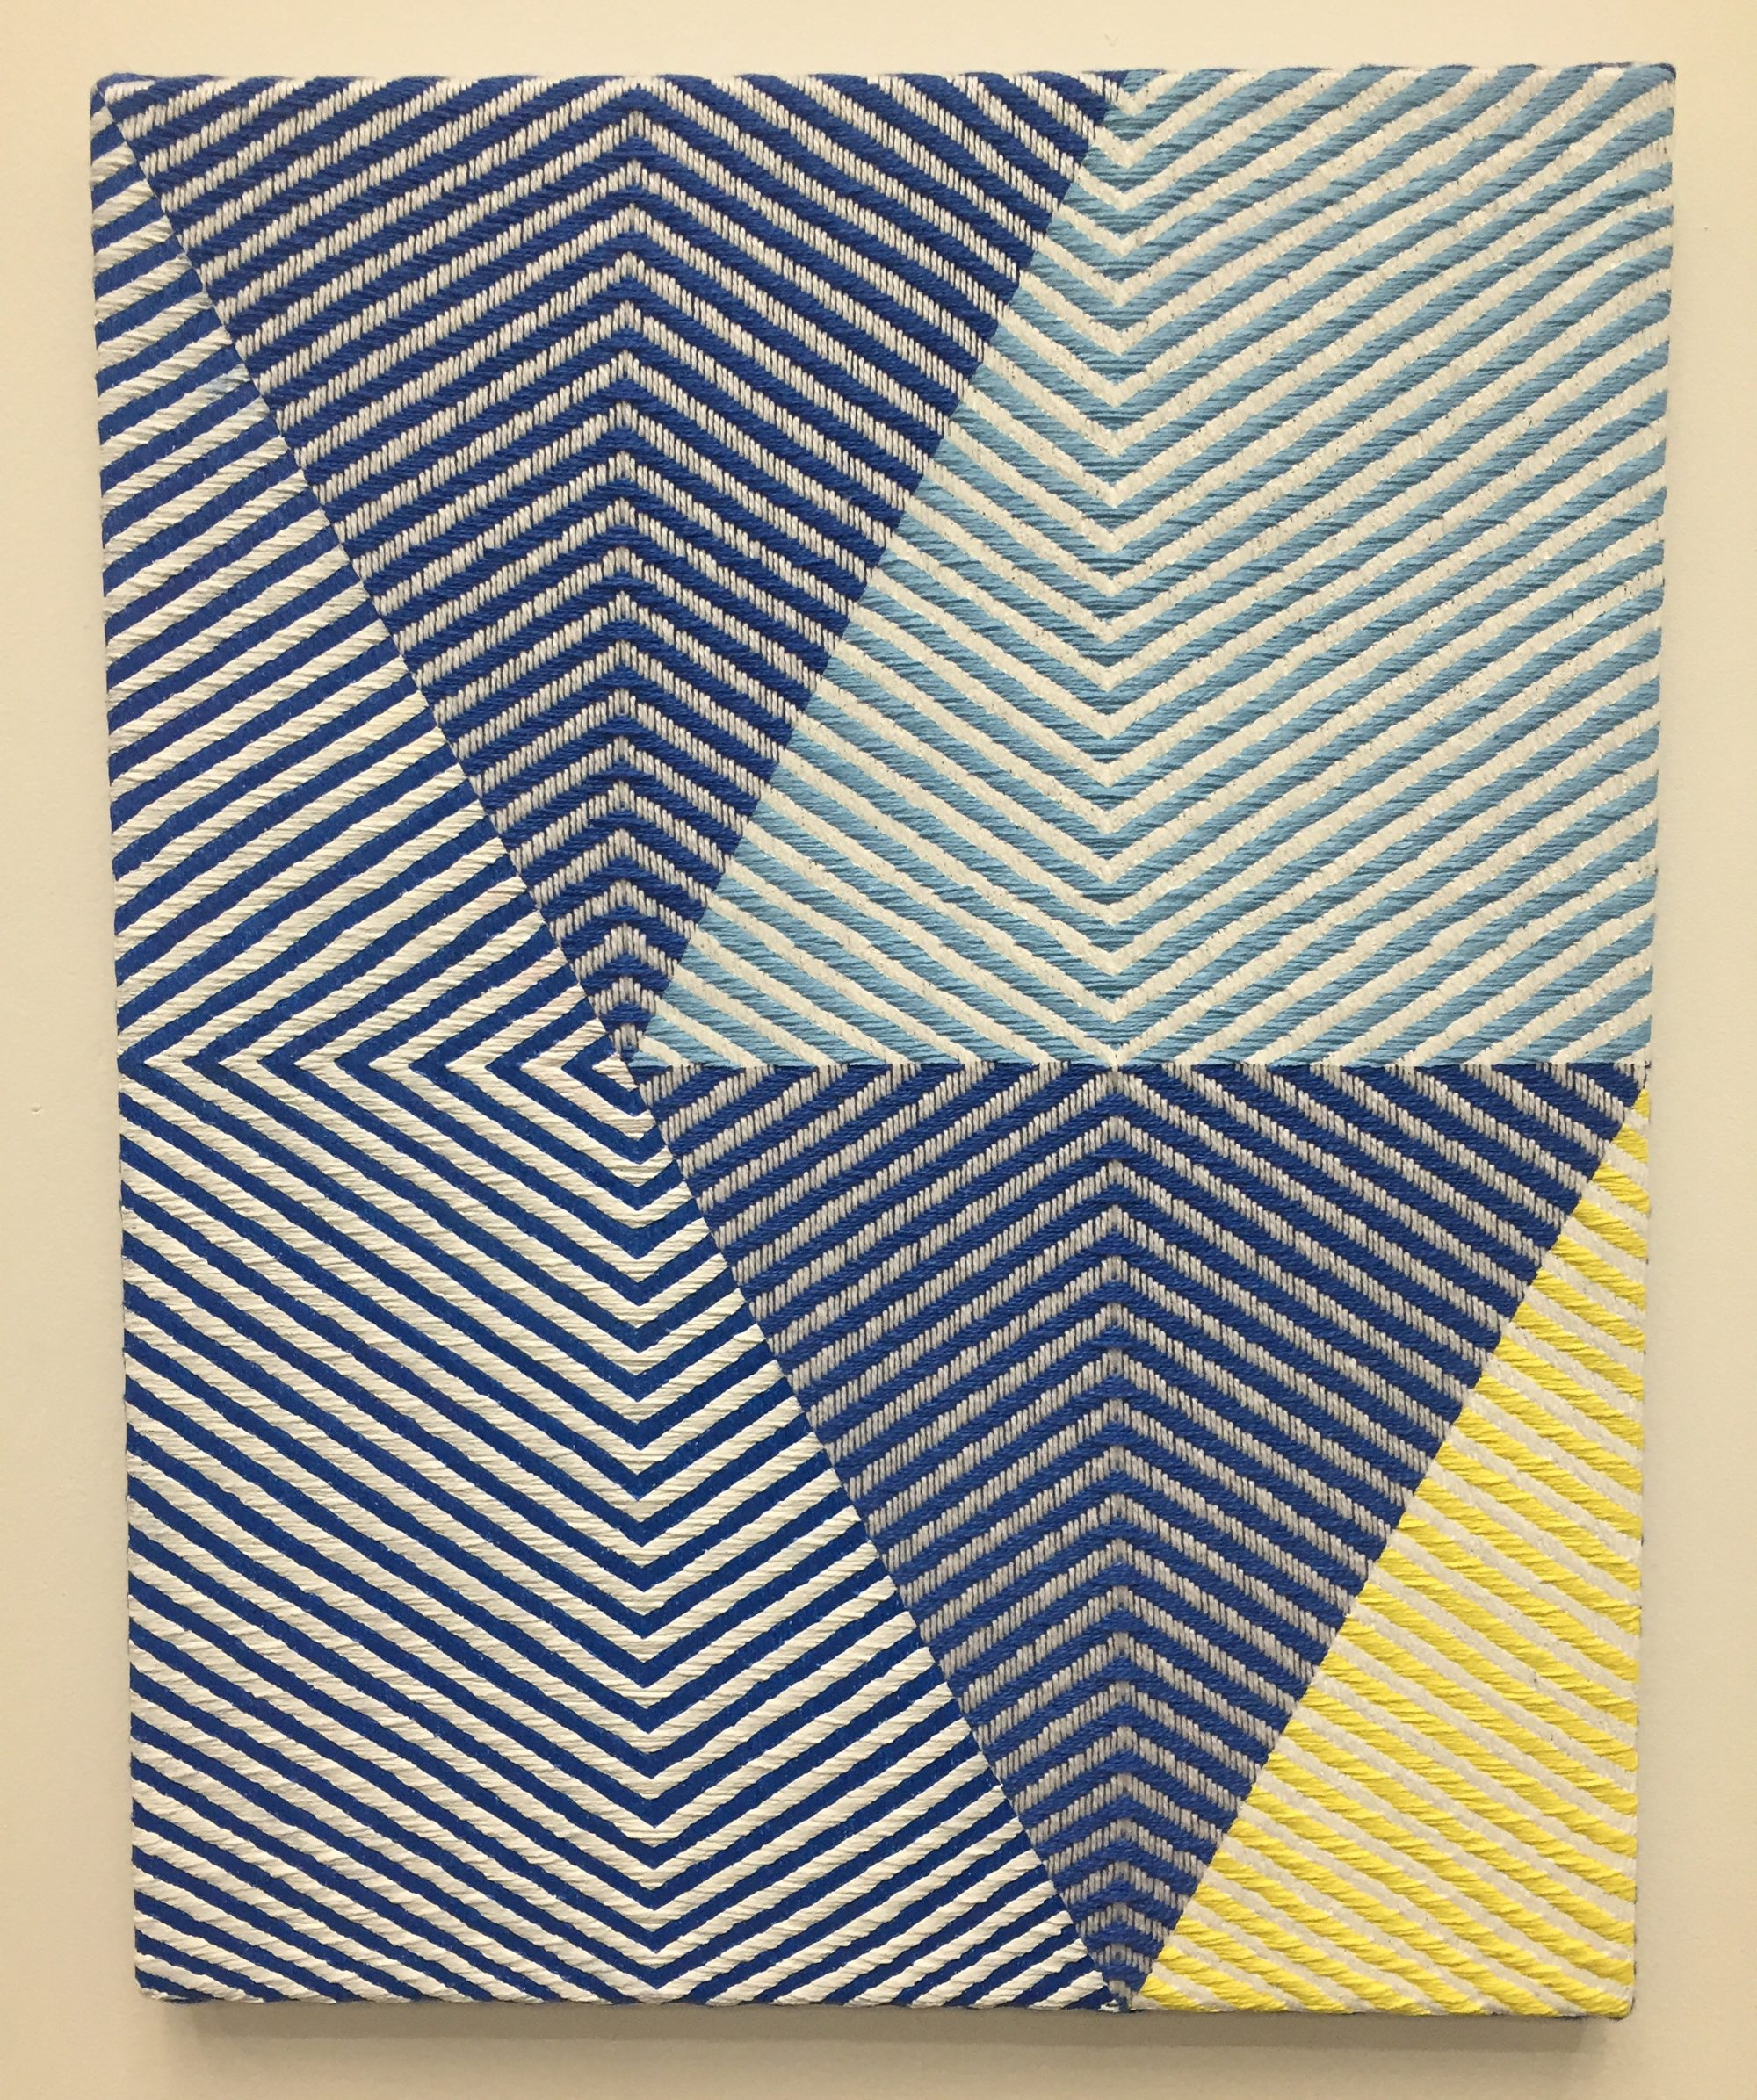 Samantha Bittman, Untitled, acrylic on handwoven textile